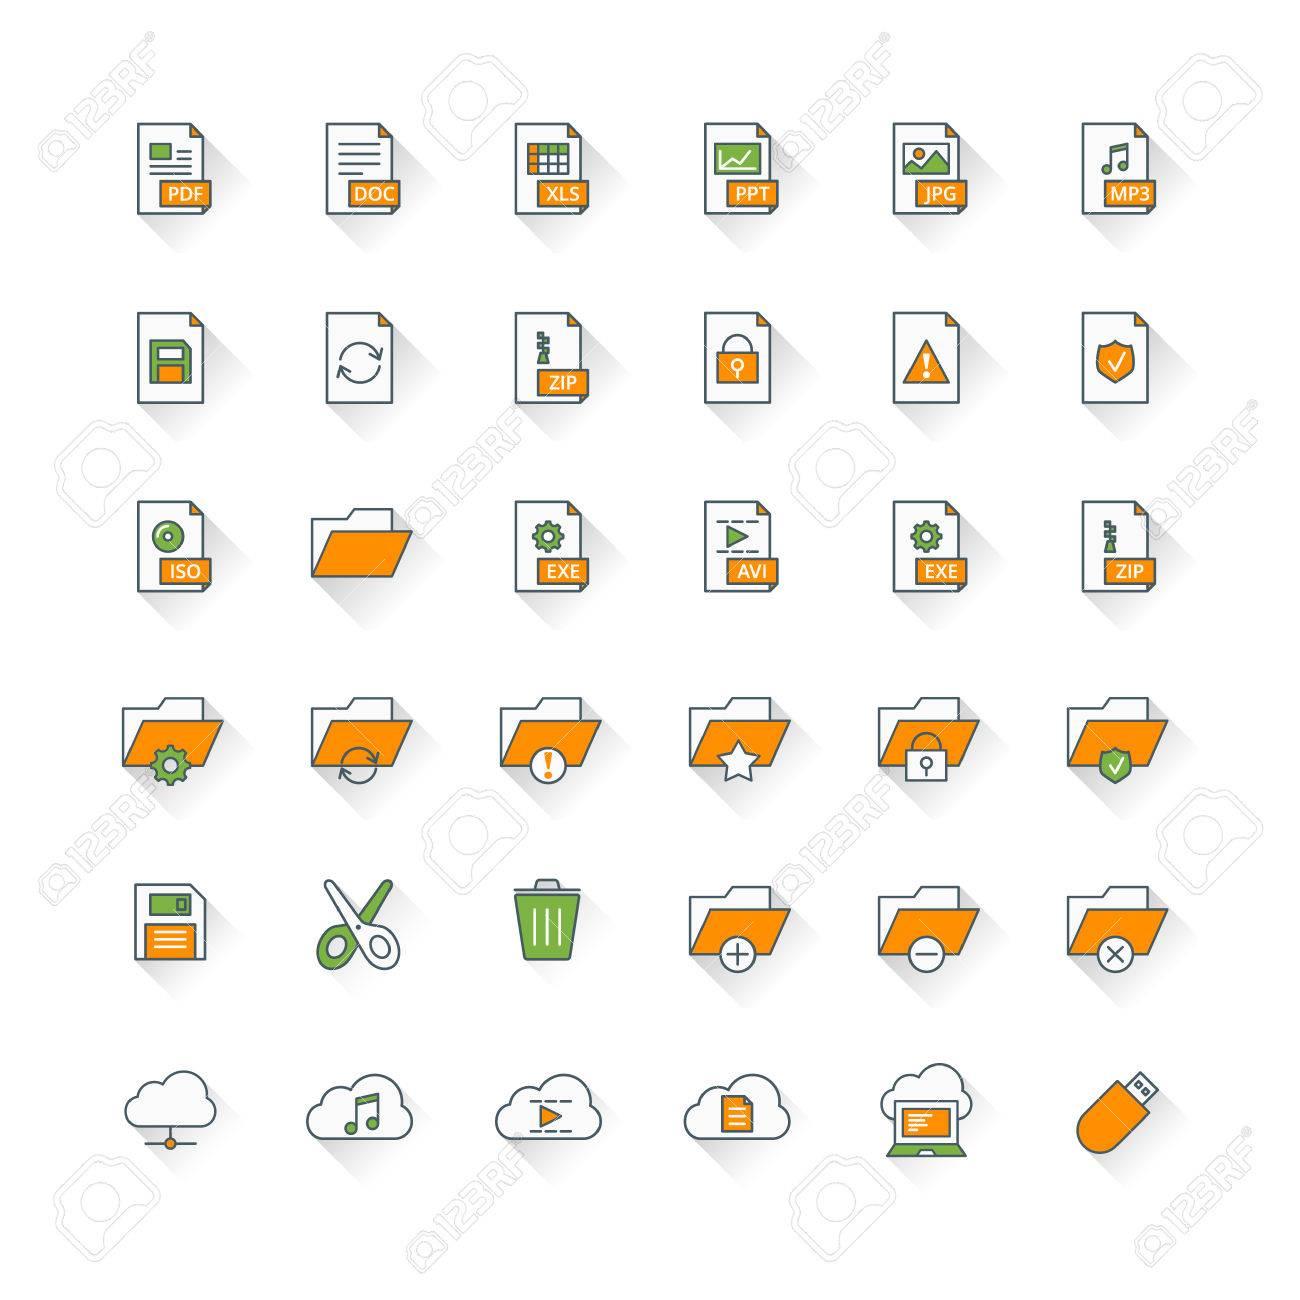 Files and folders flat design icon set  File type, folders, cloud